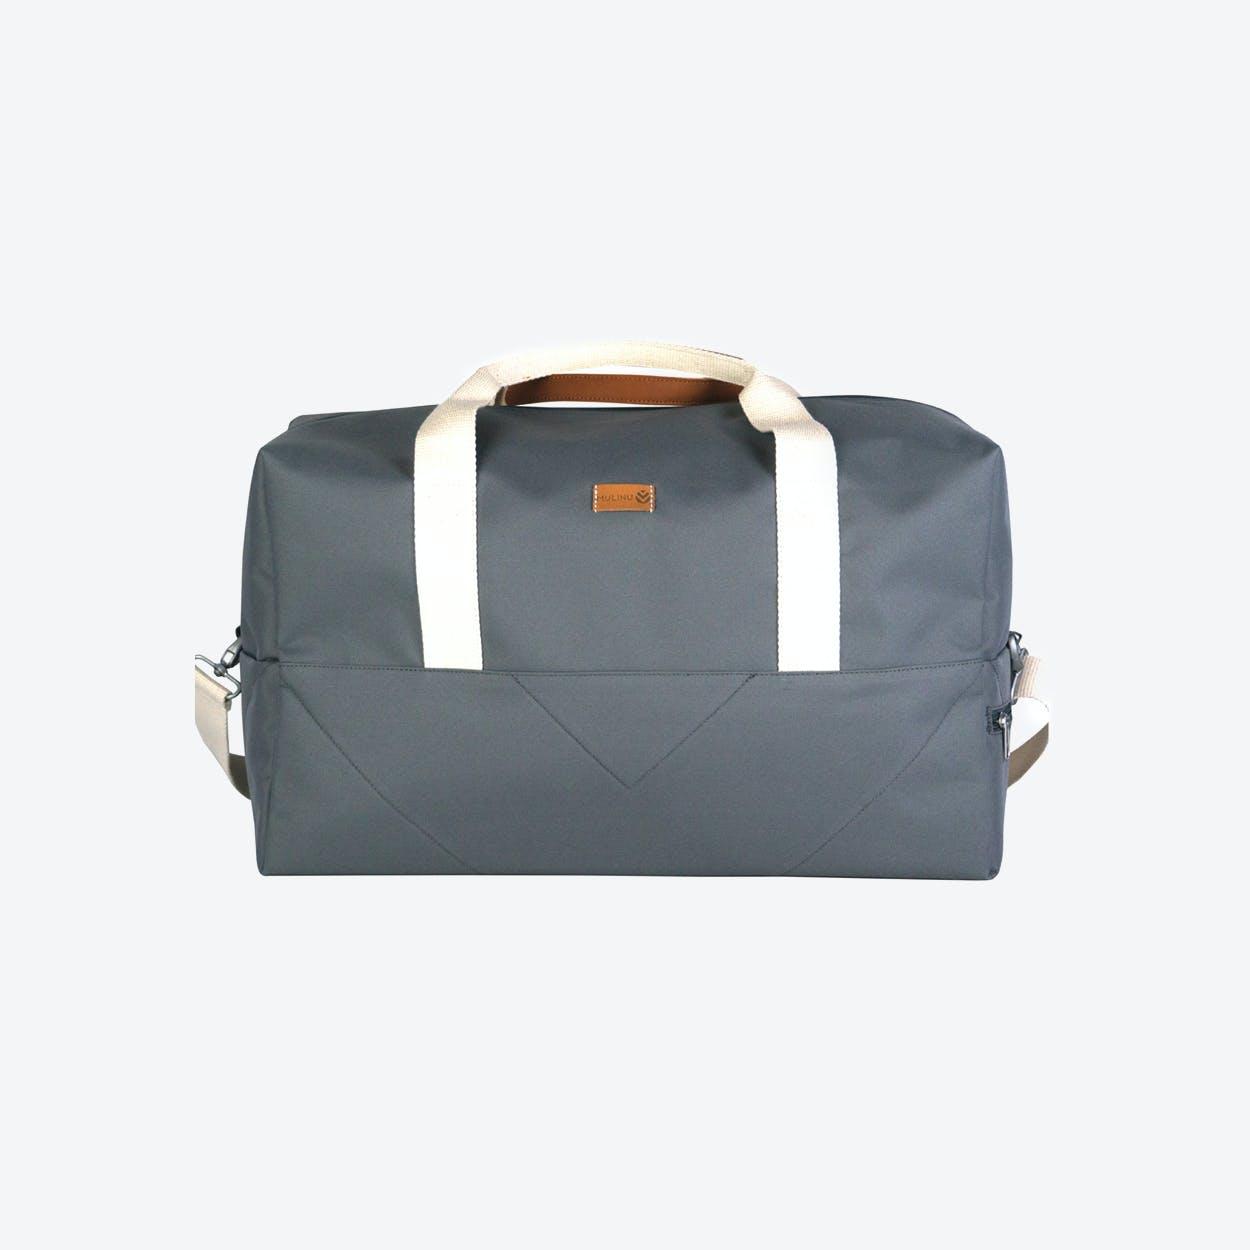 CLASSIC LASSE Grey